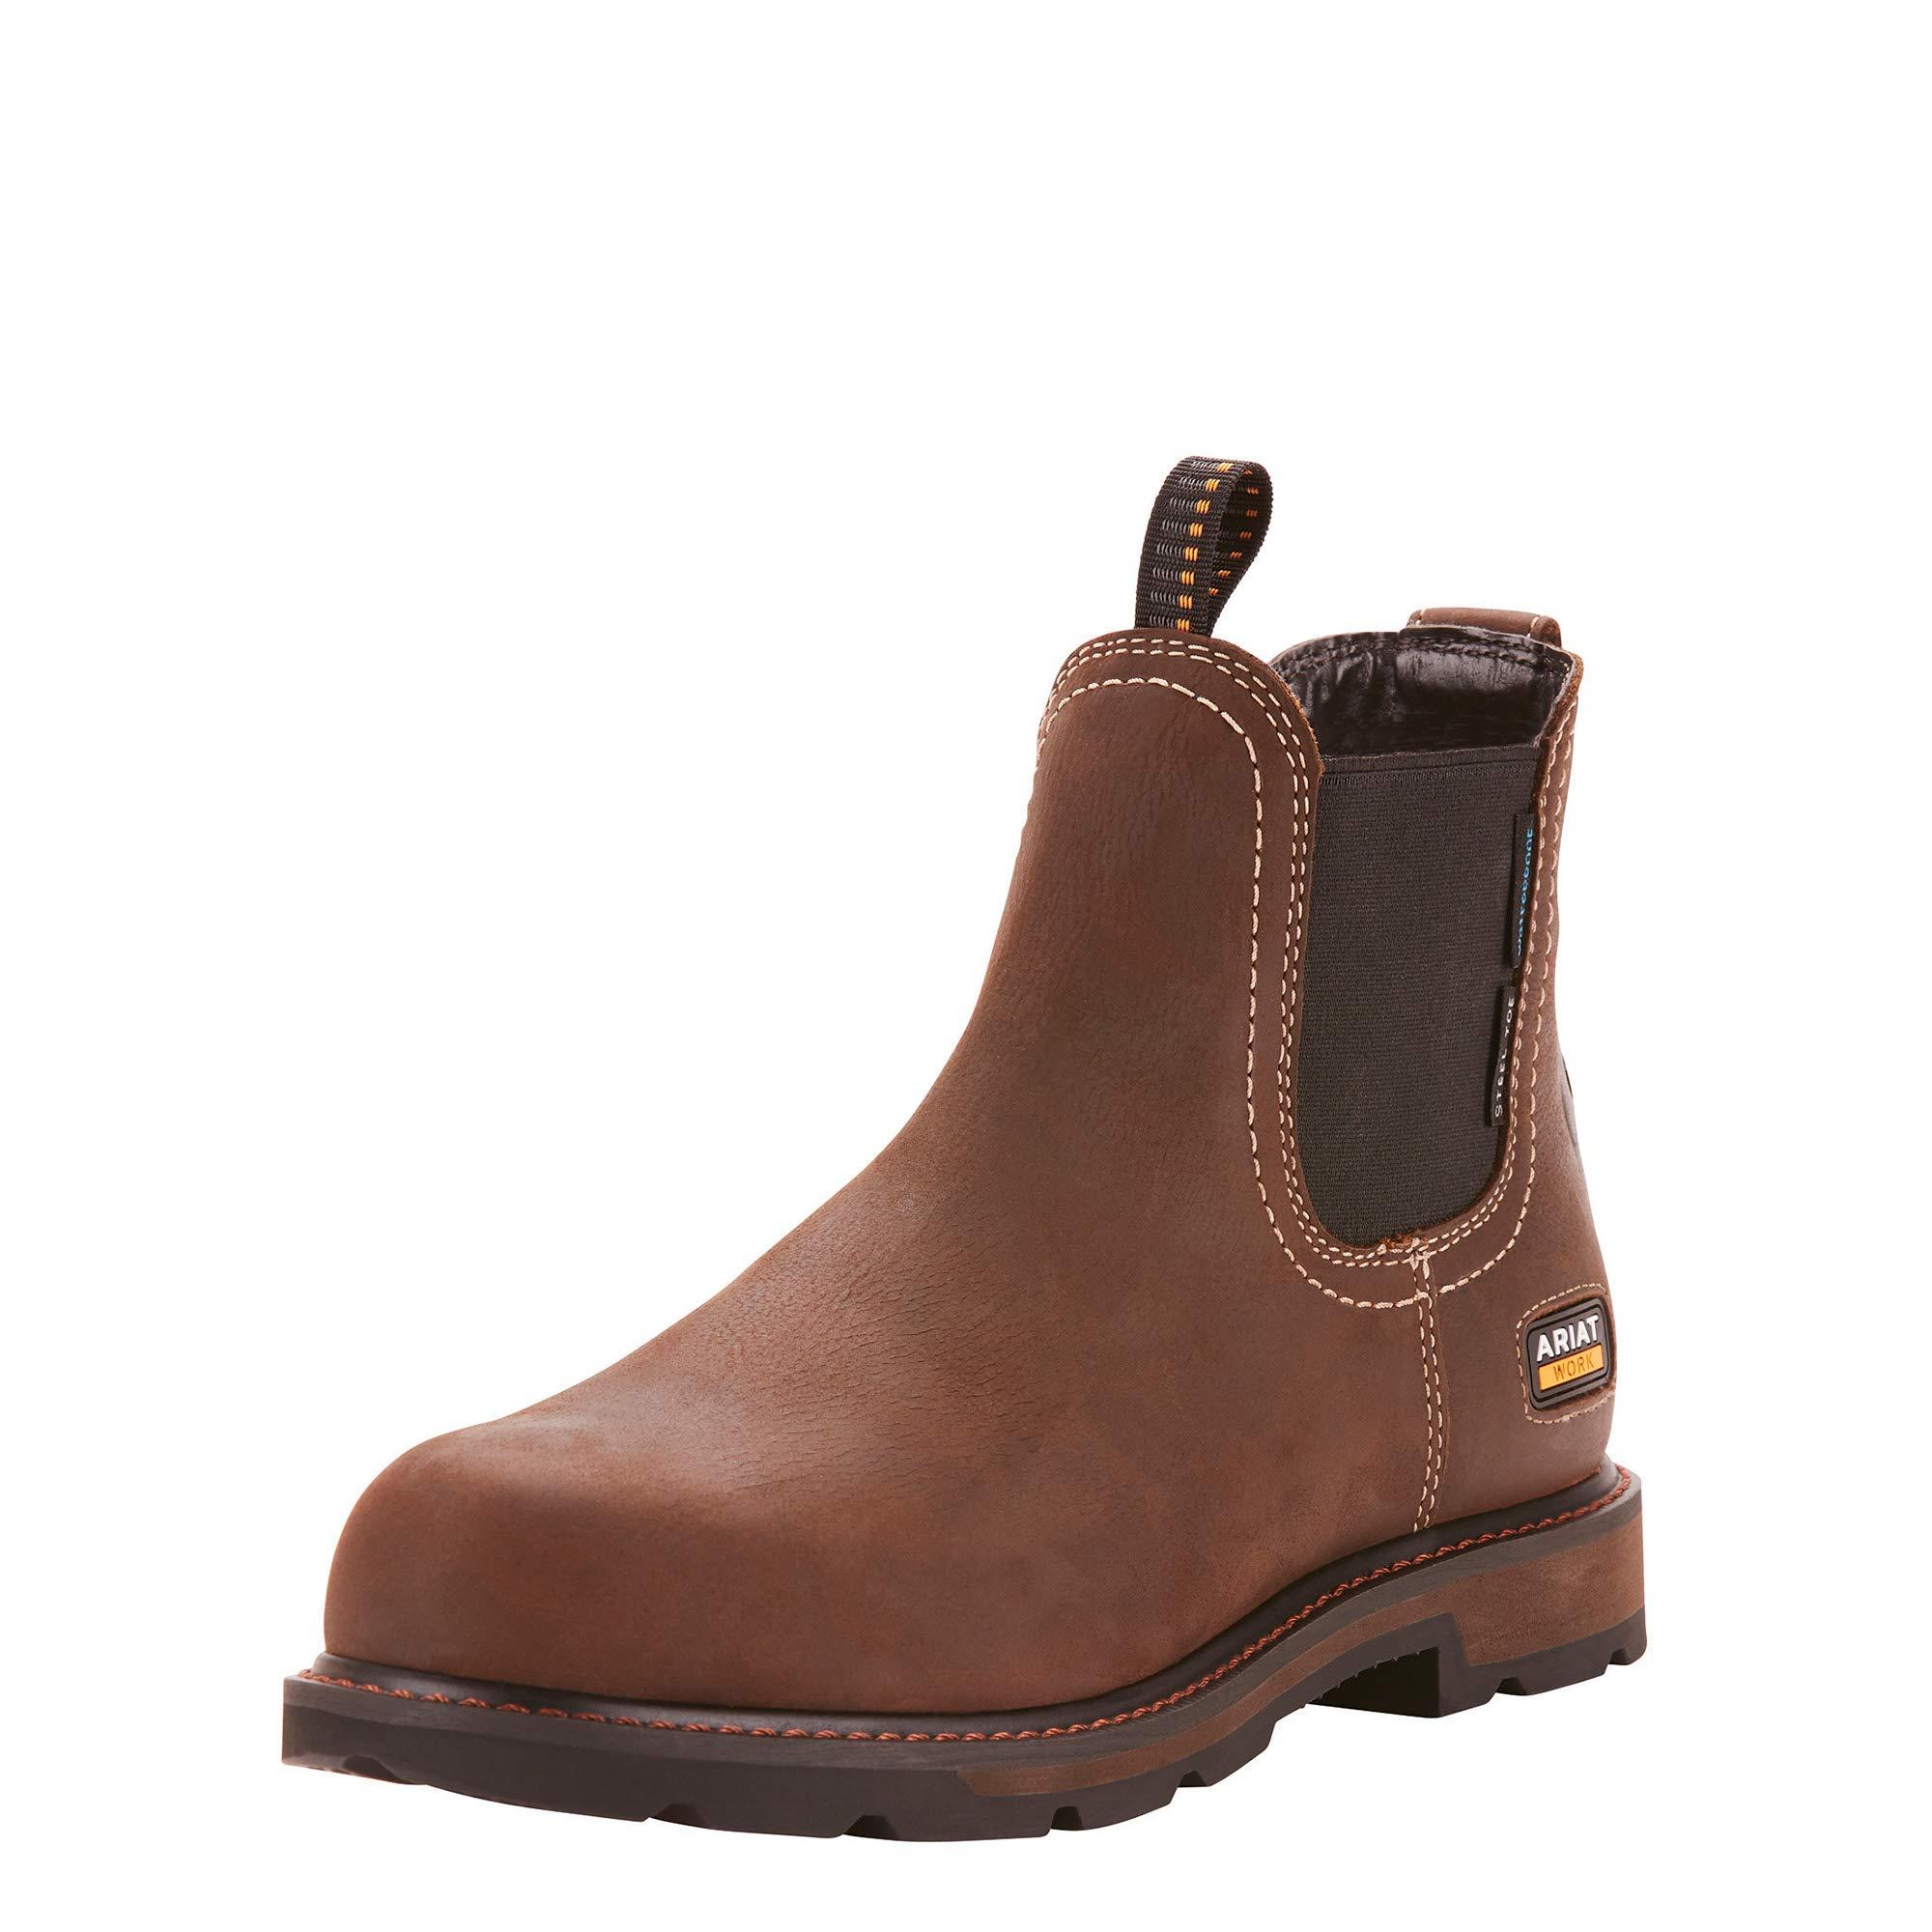 Ariat Work Men's Groundbreaker H2O Steel Toe Western Boot, Dark Brown-1, 10.5 D US by ARIAT